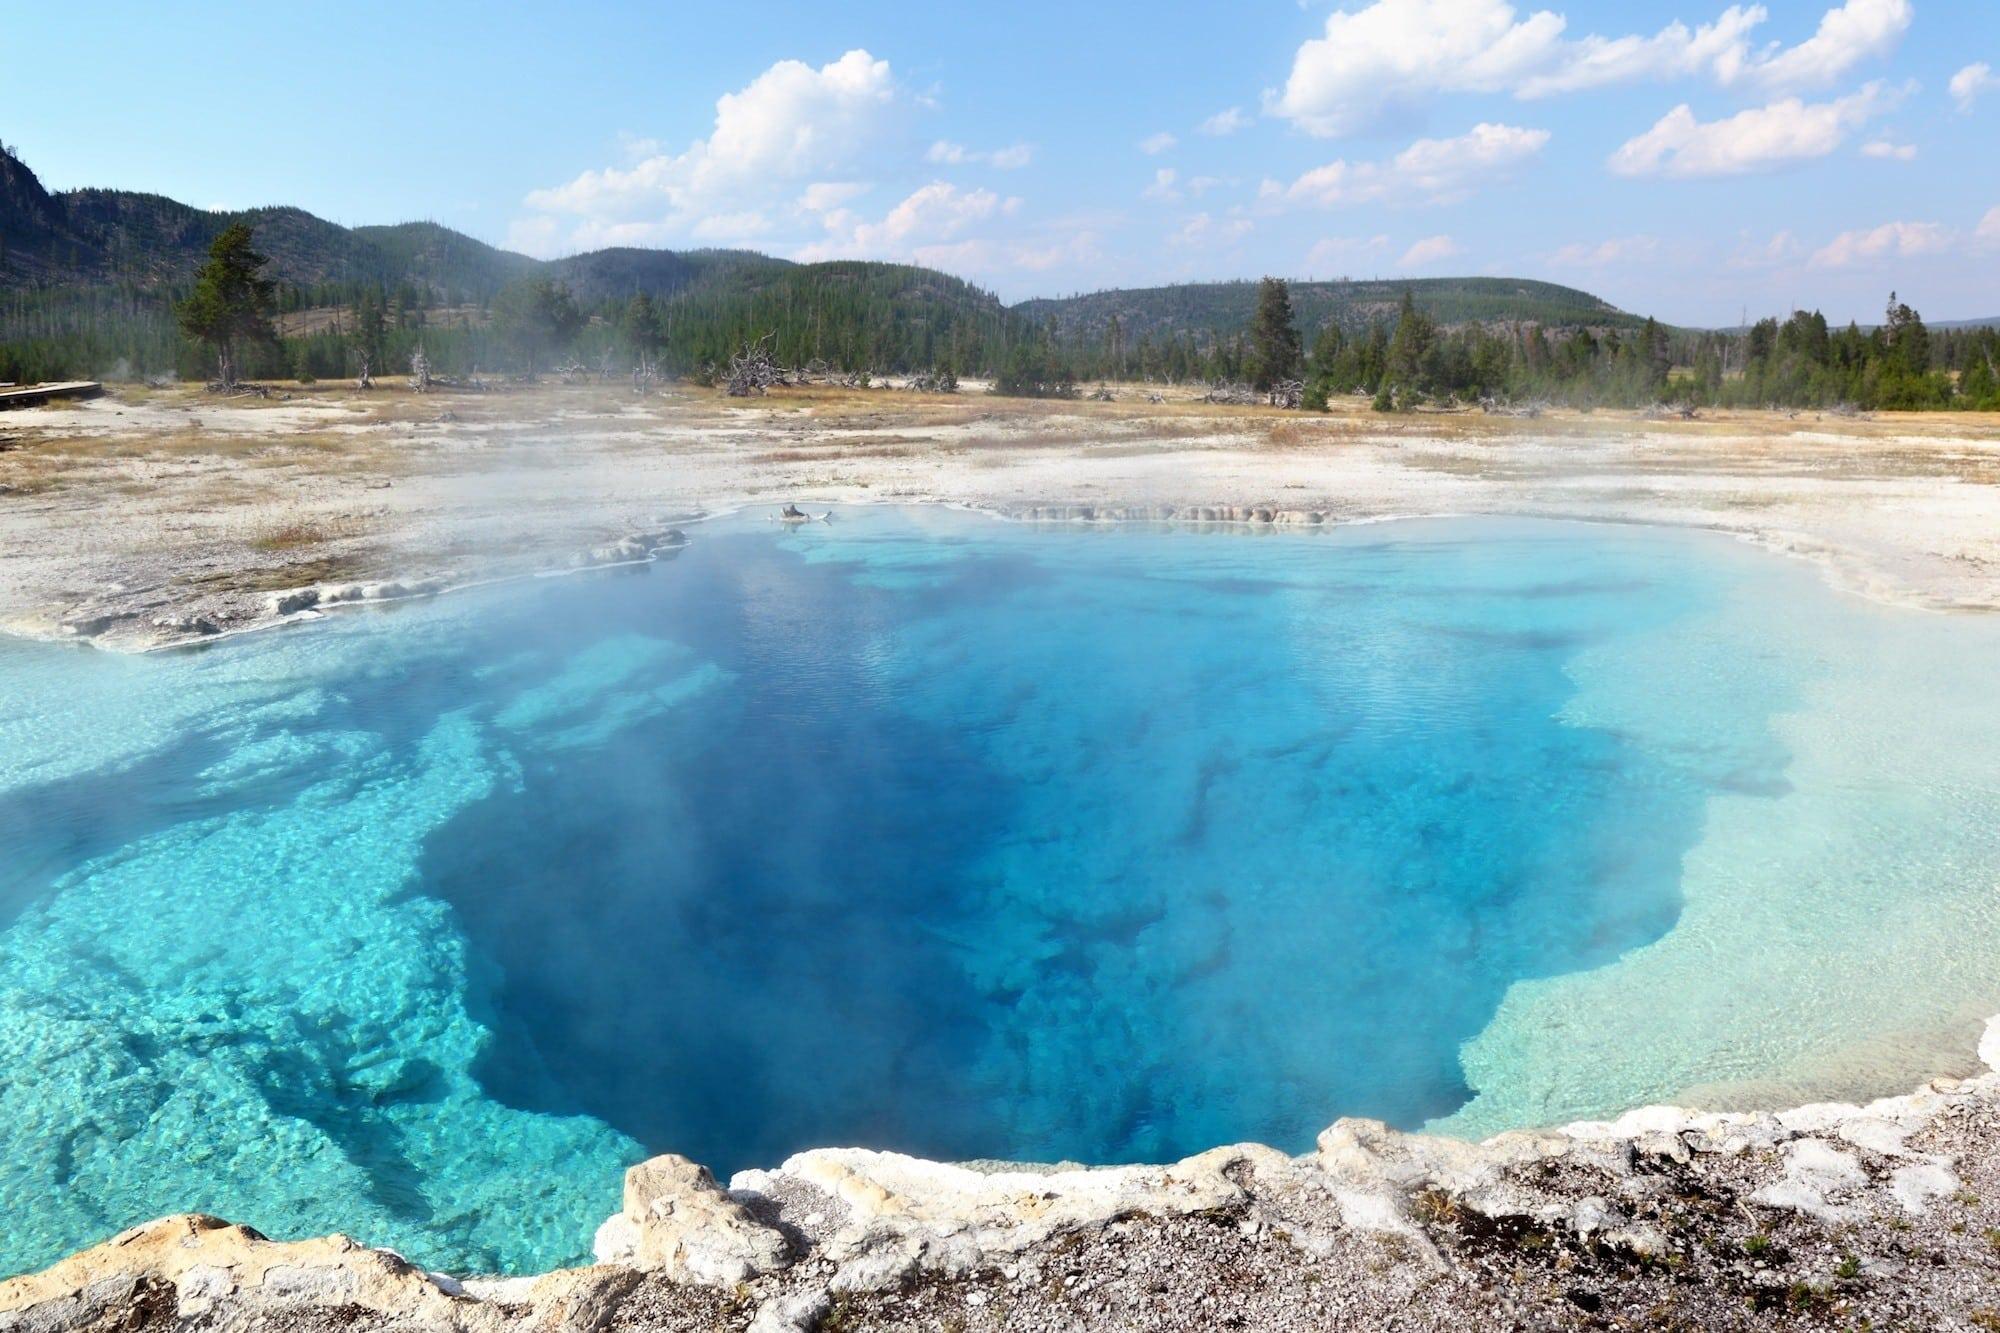 The Ultimate 7-day Teton & Yellowstone Road Trip Itinerary